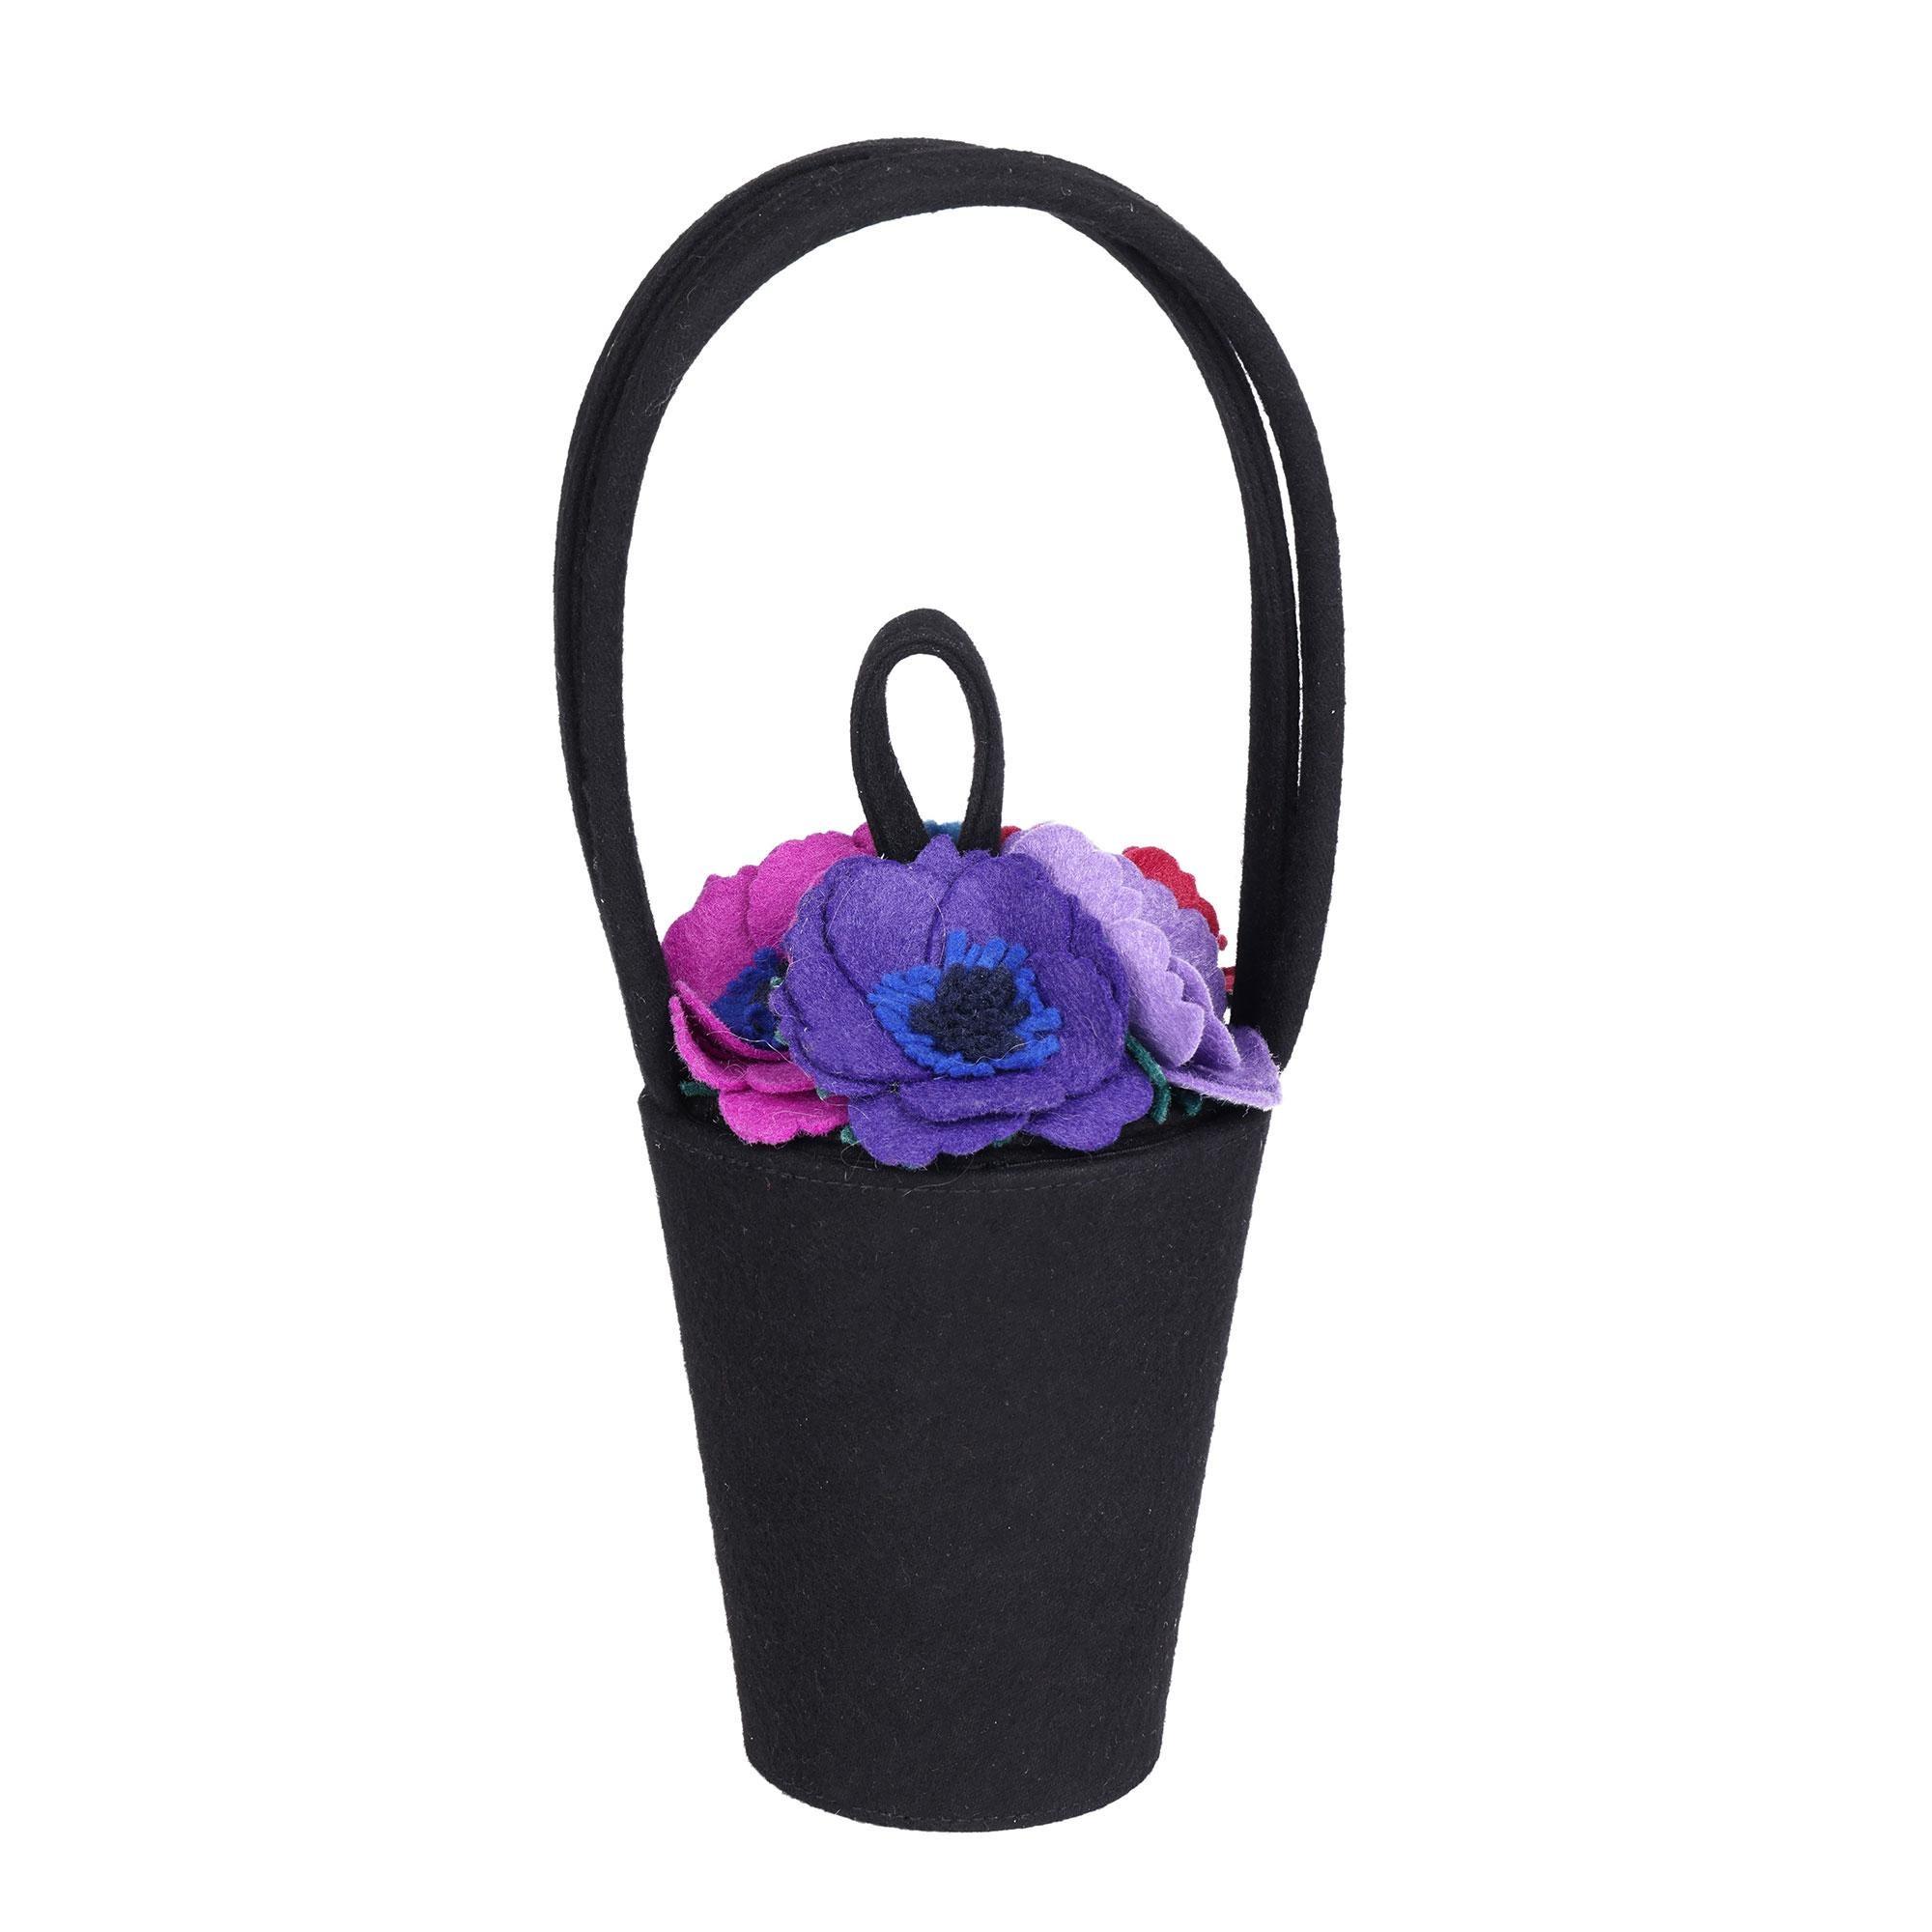 Lulu Guinness Black, Pink, Purple, Blue, Green & Red Felt Vintage Florist Bag